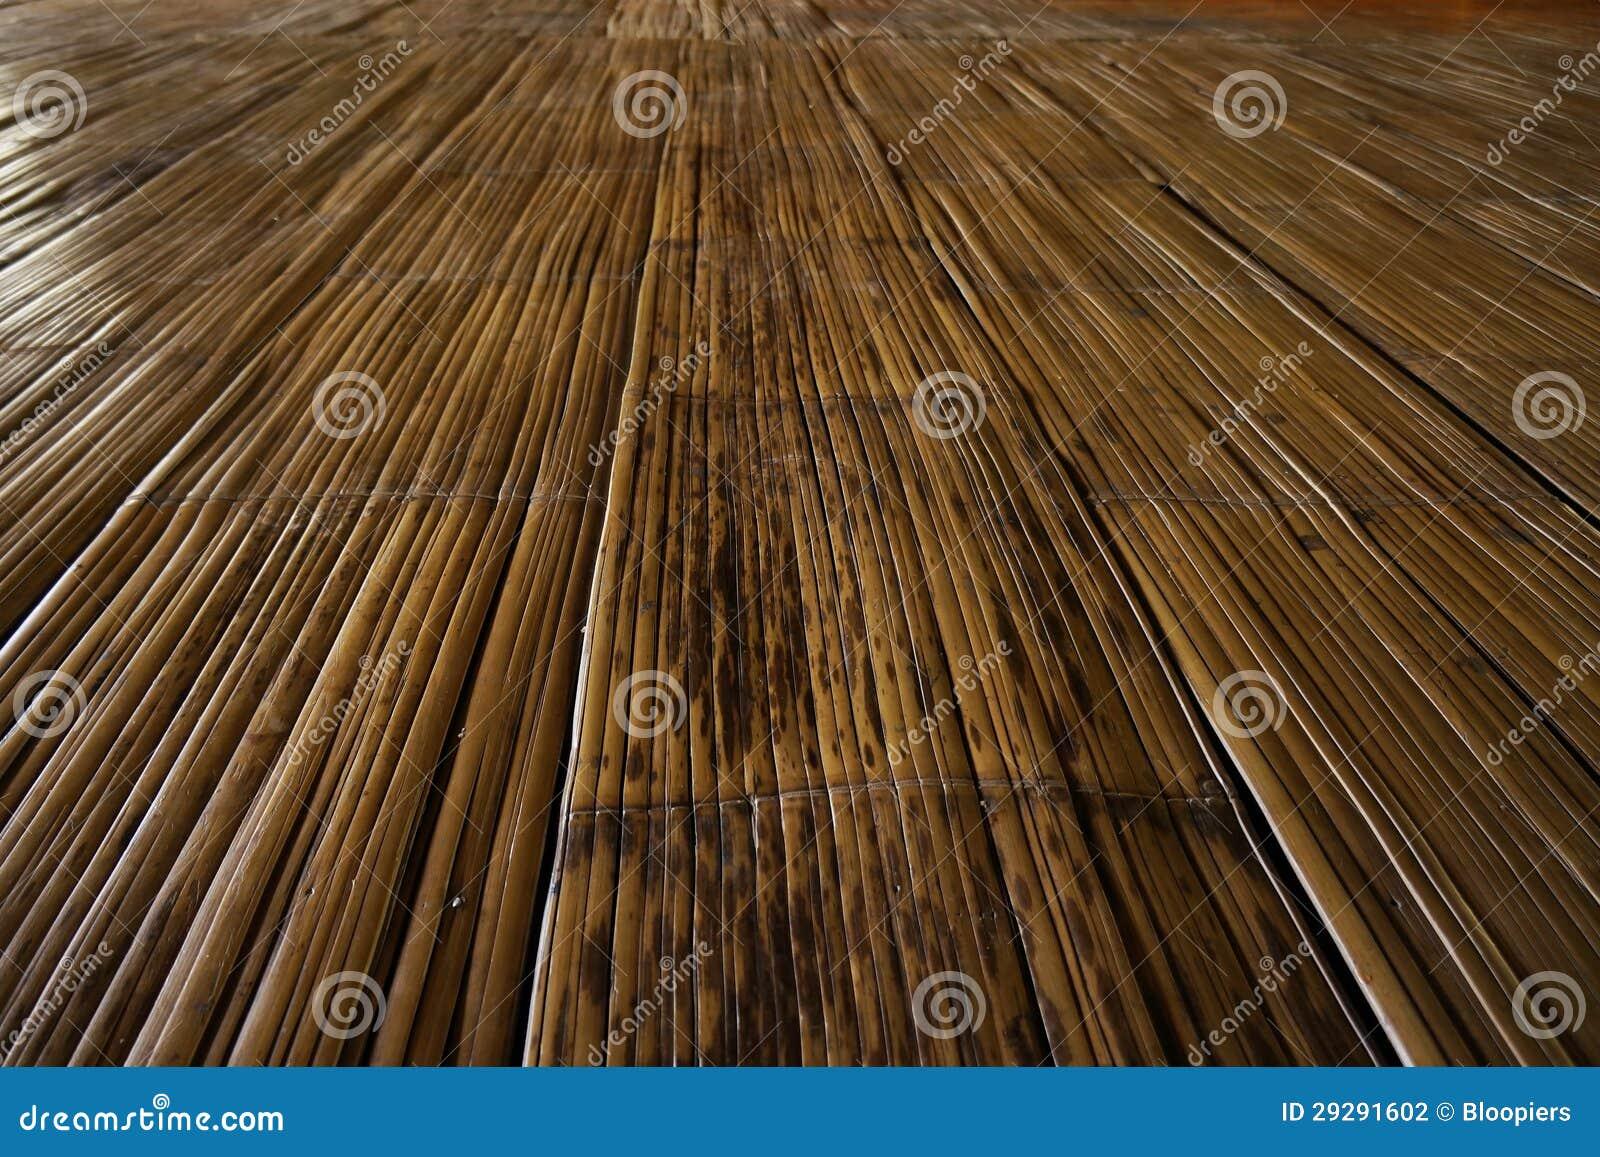 Fußboden Aus Bambus ~ Bambus fußboden stockfoto colourbox